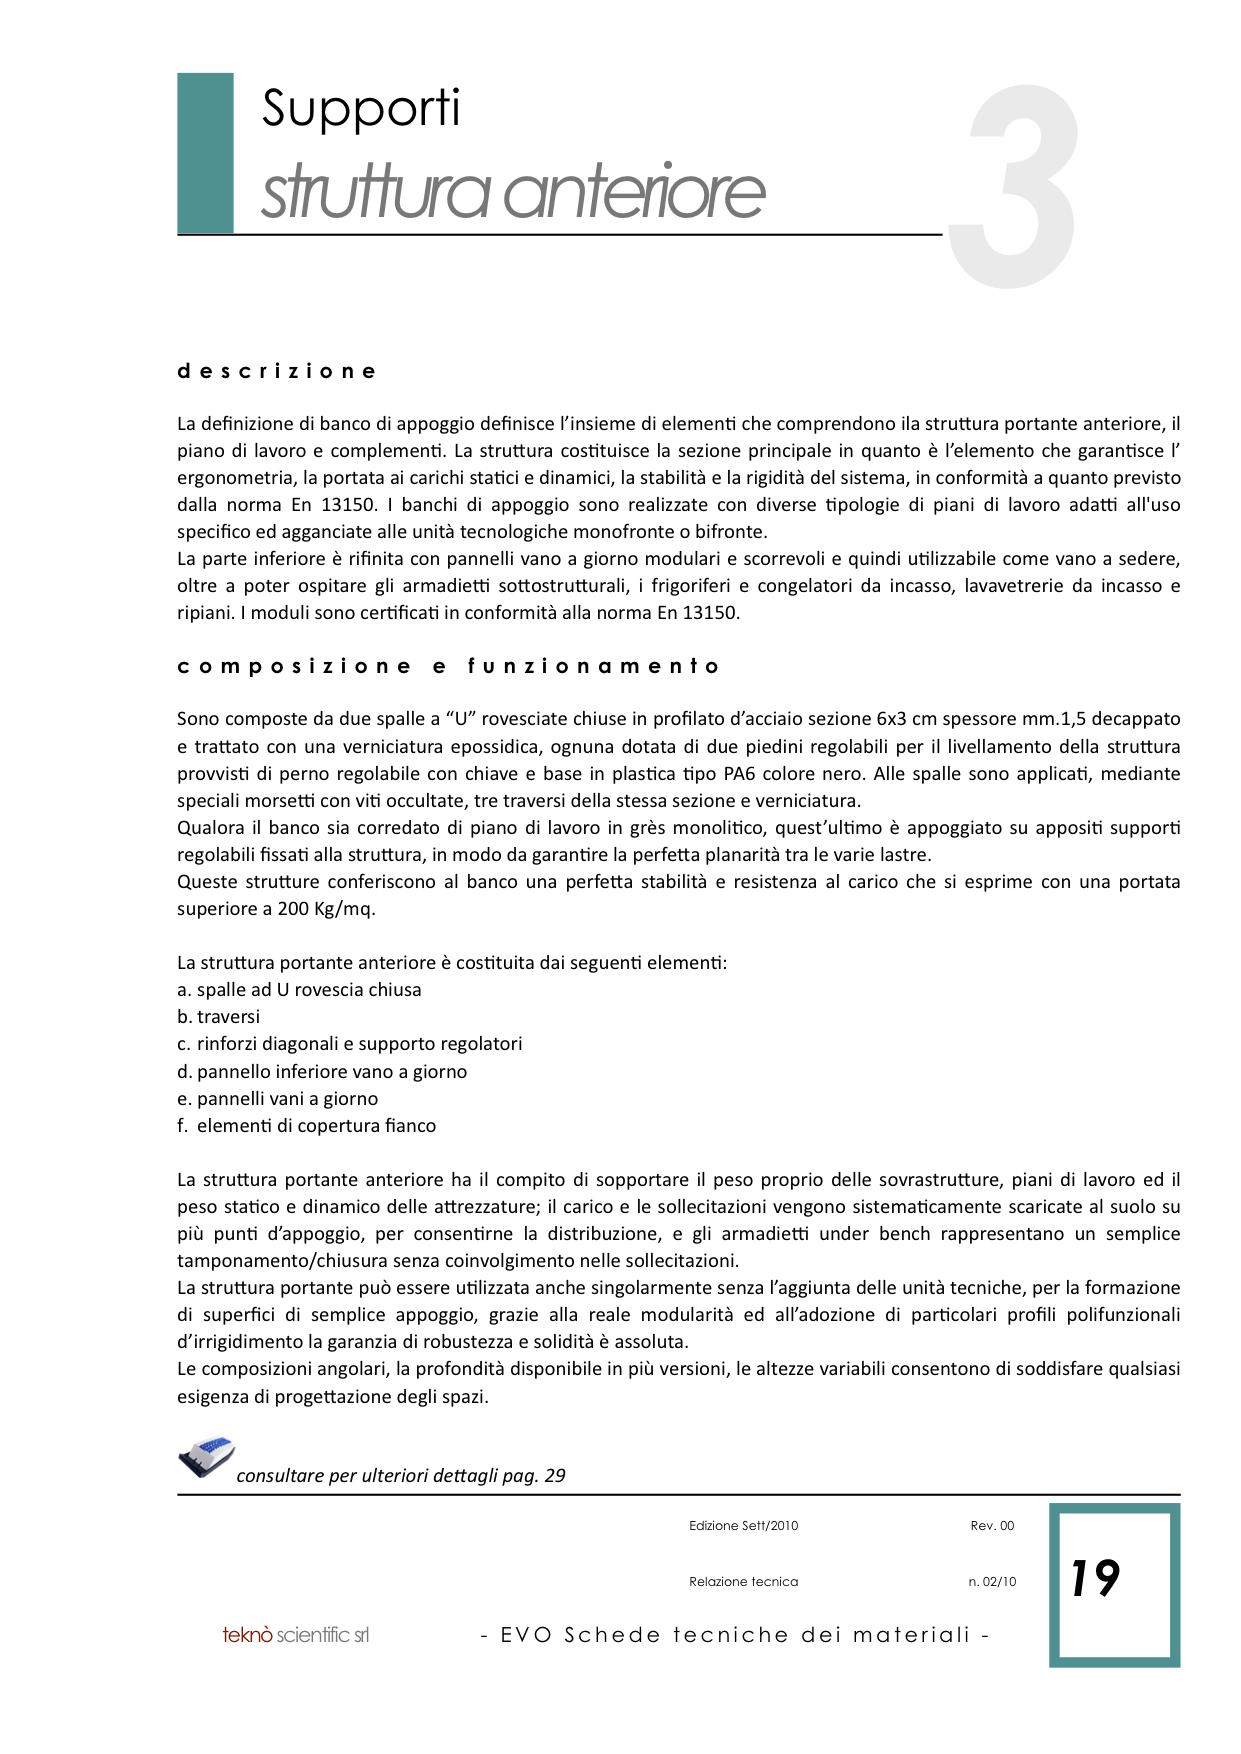 EVO Schede Tecniche materiali copia 9.png